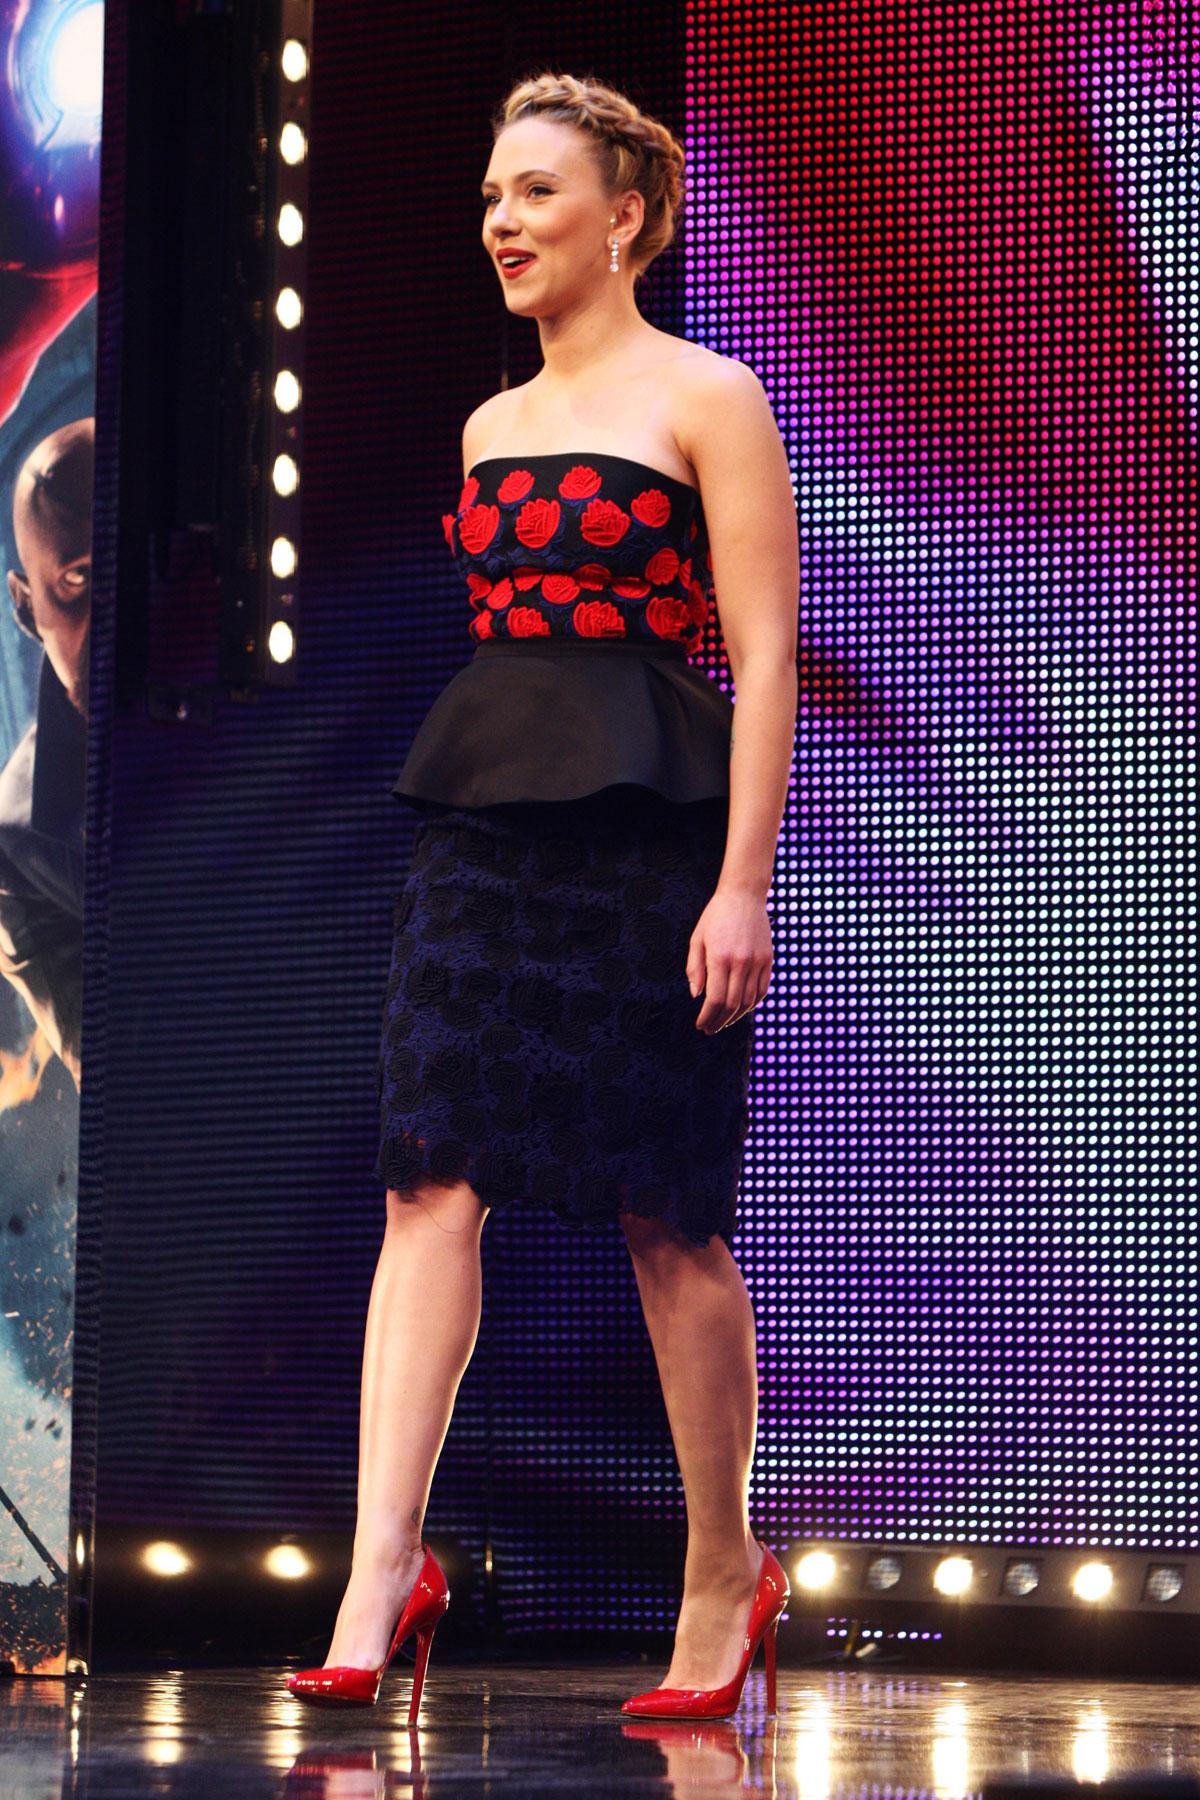 SCARLETT JOHANSSON At The Avengers Premiere In London